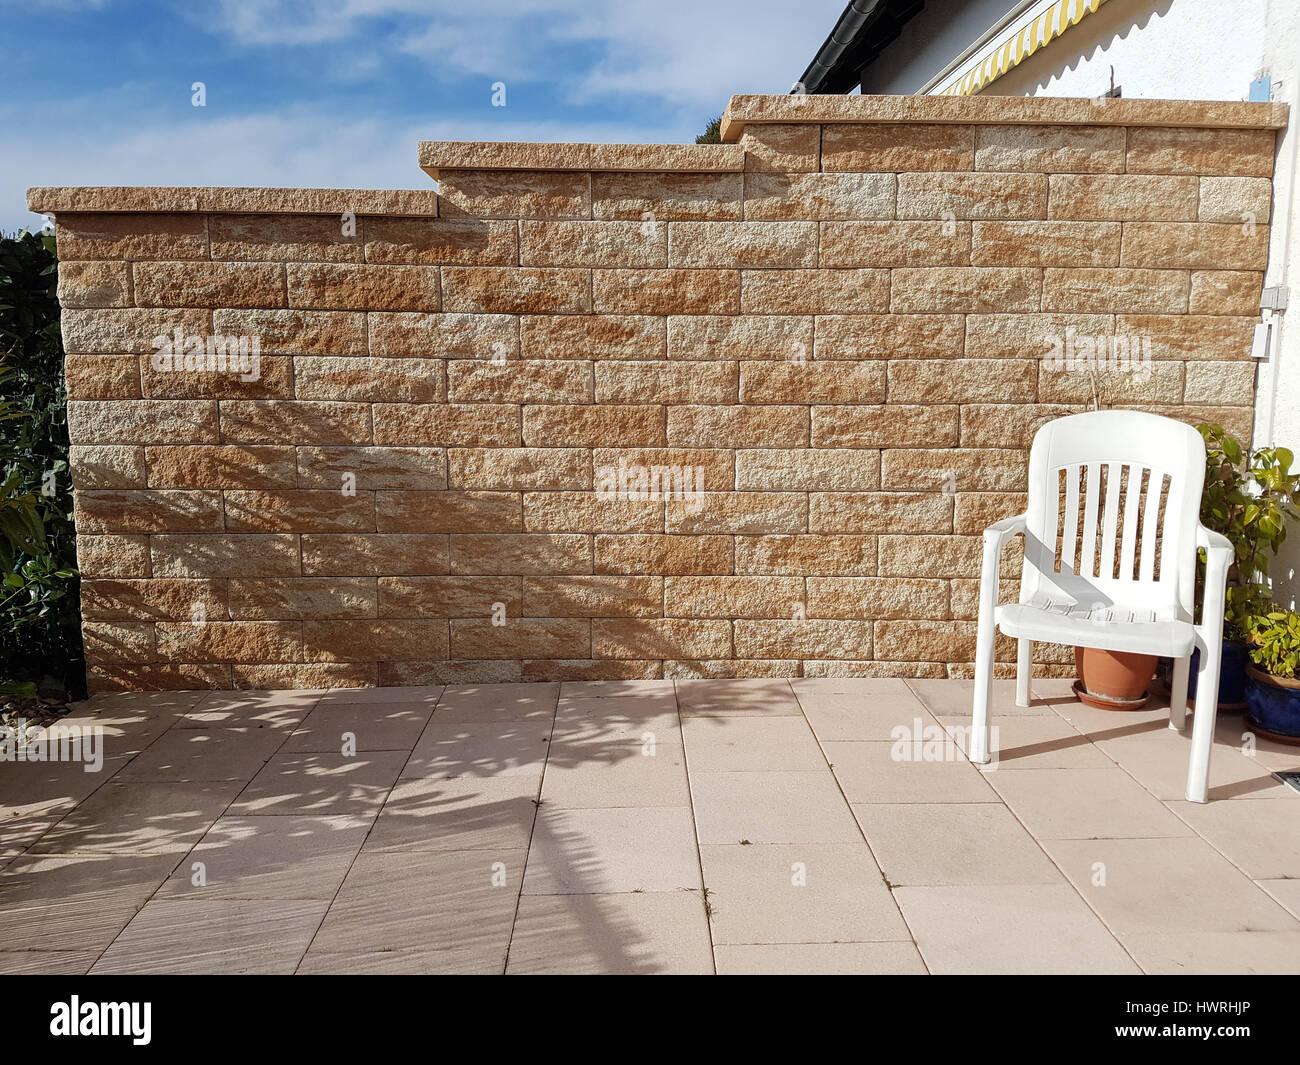 Sichtschutz Mauer Gemauert Stock Photo Alamy